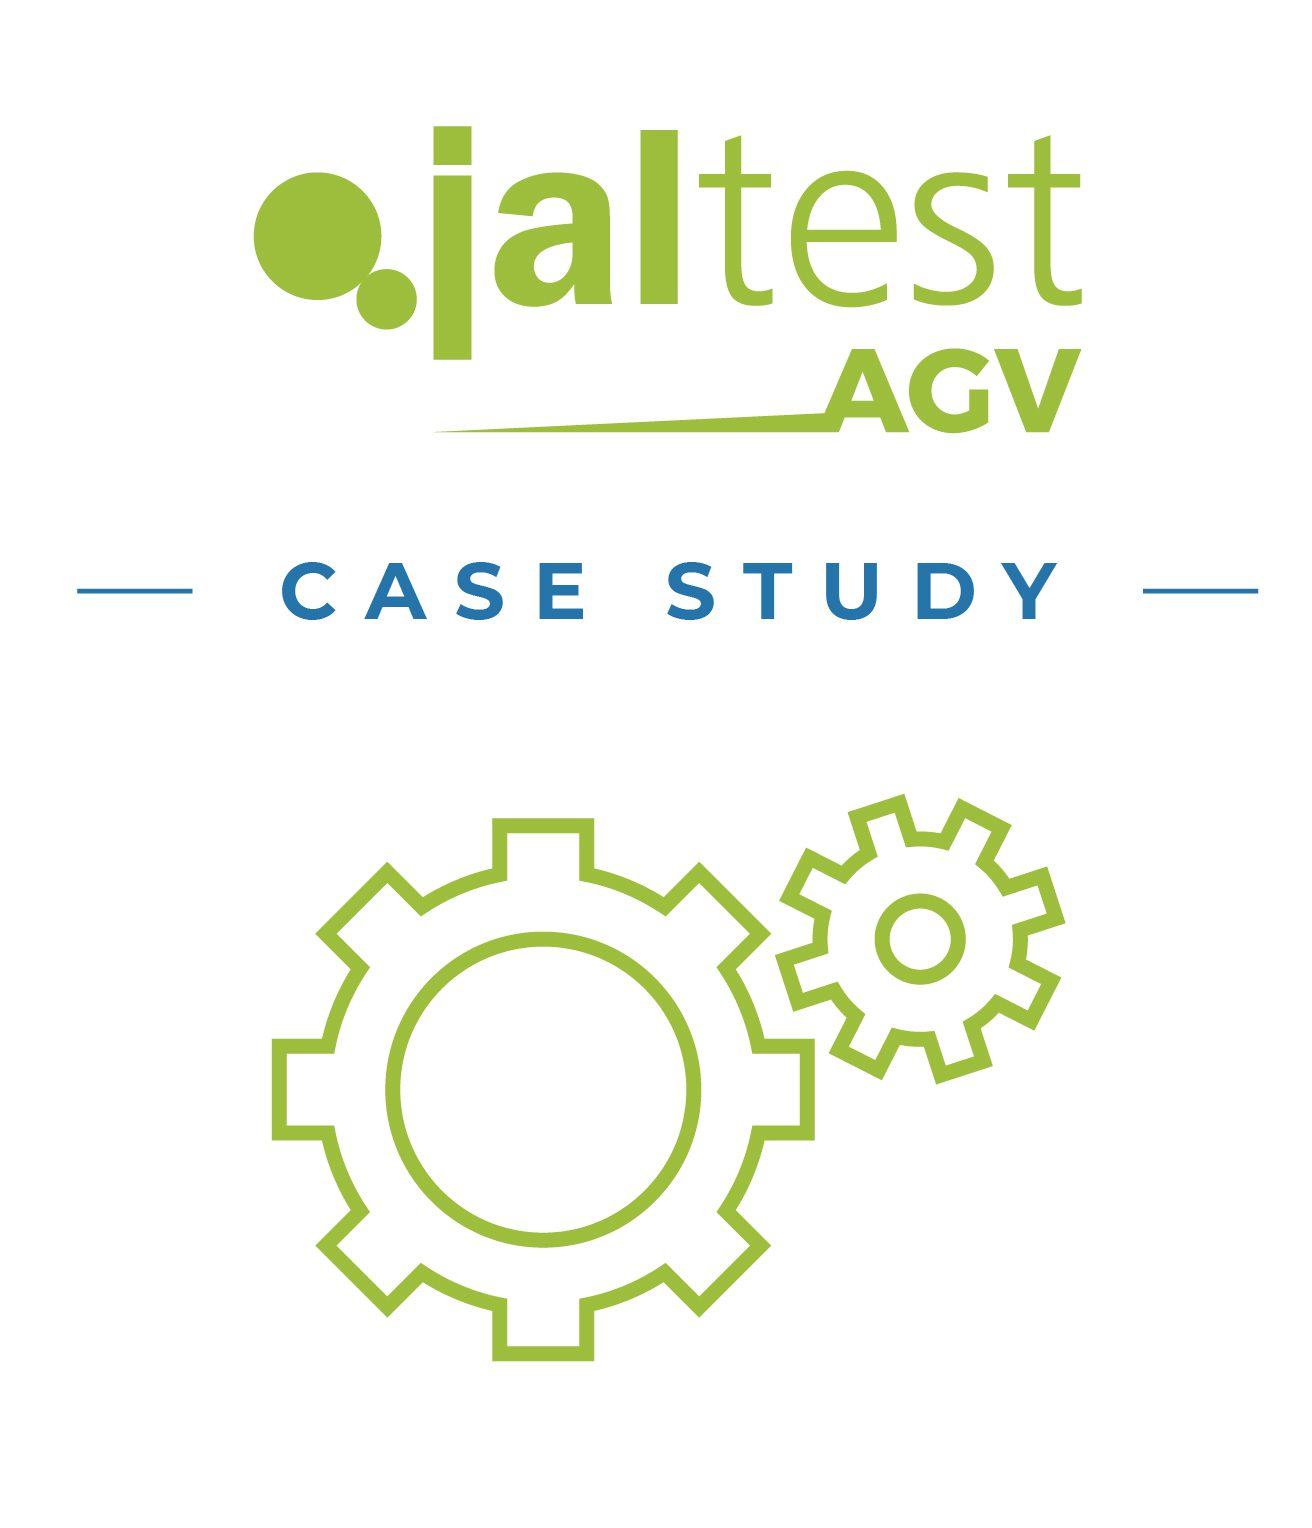 Case-Study_AGV-trasmission